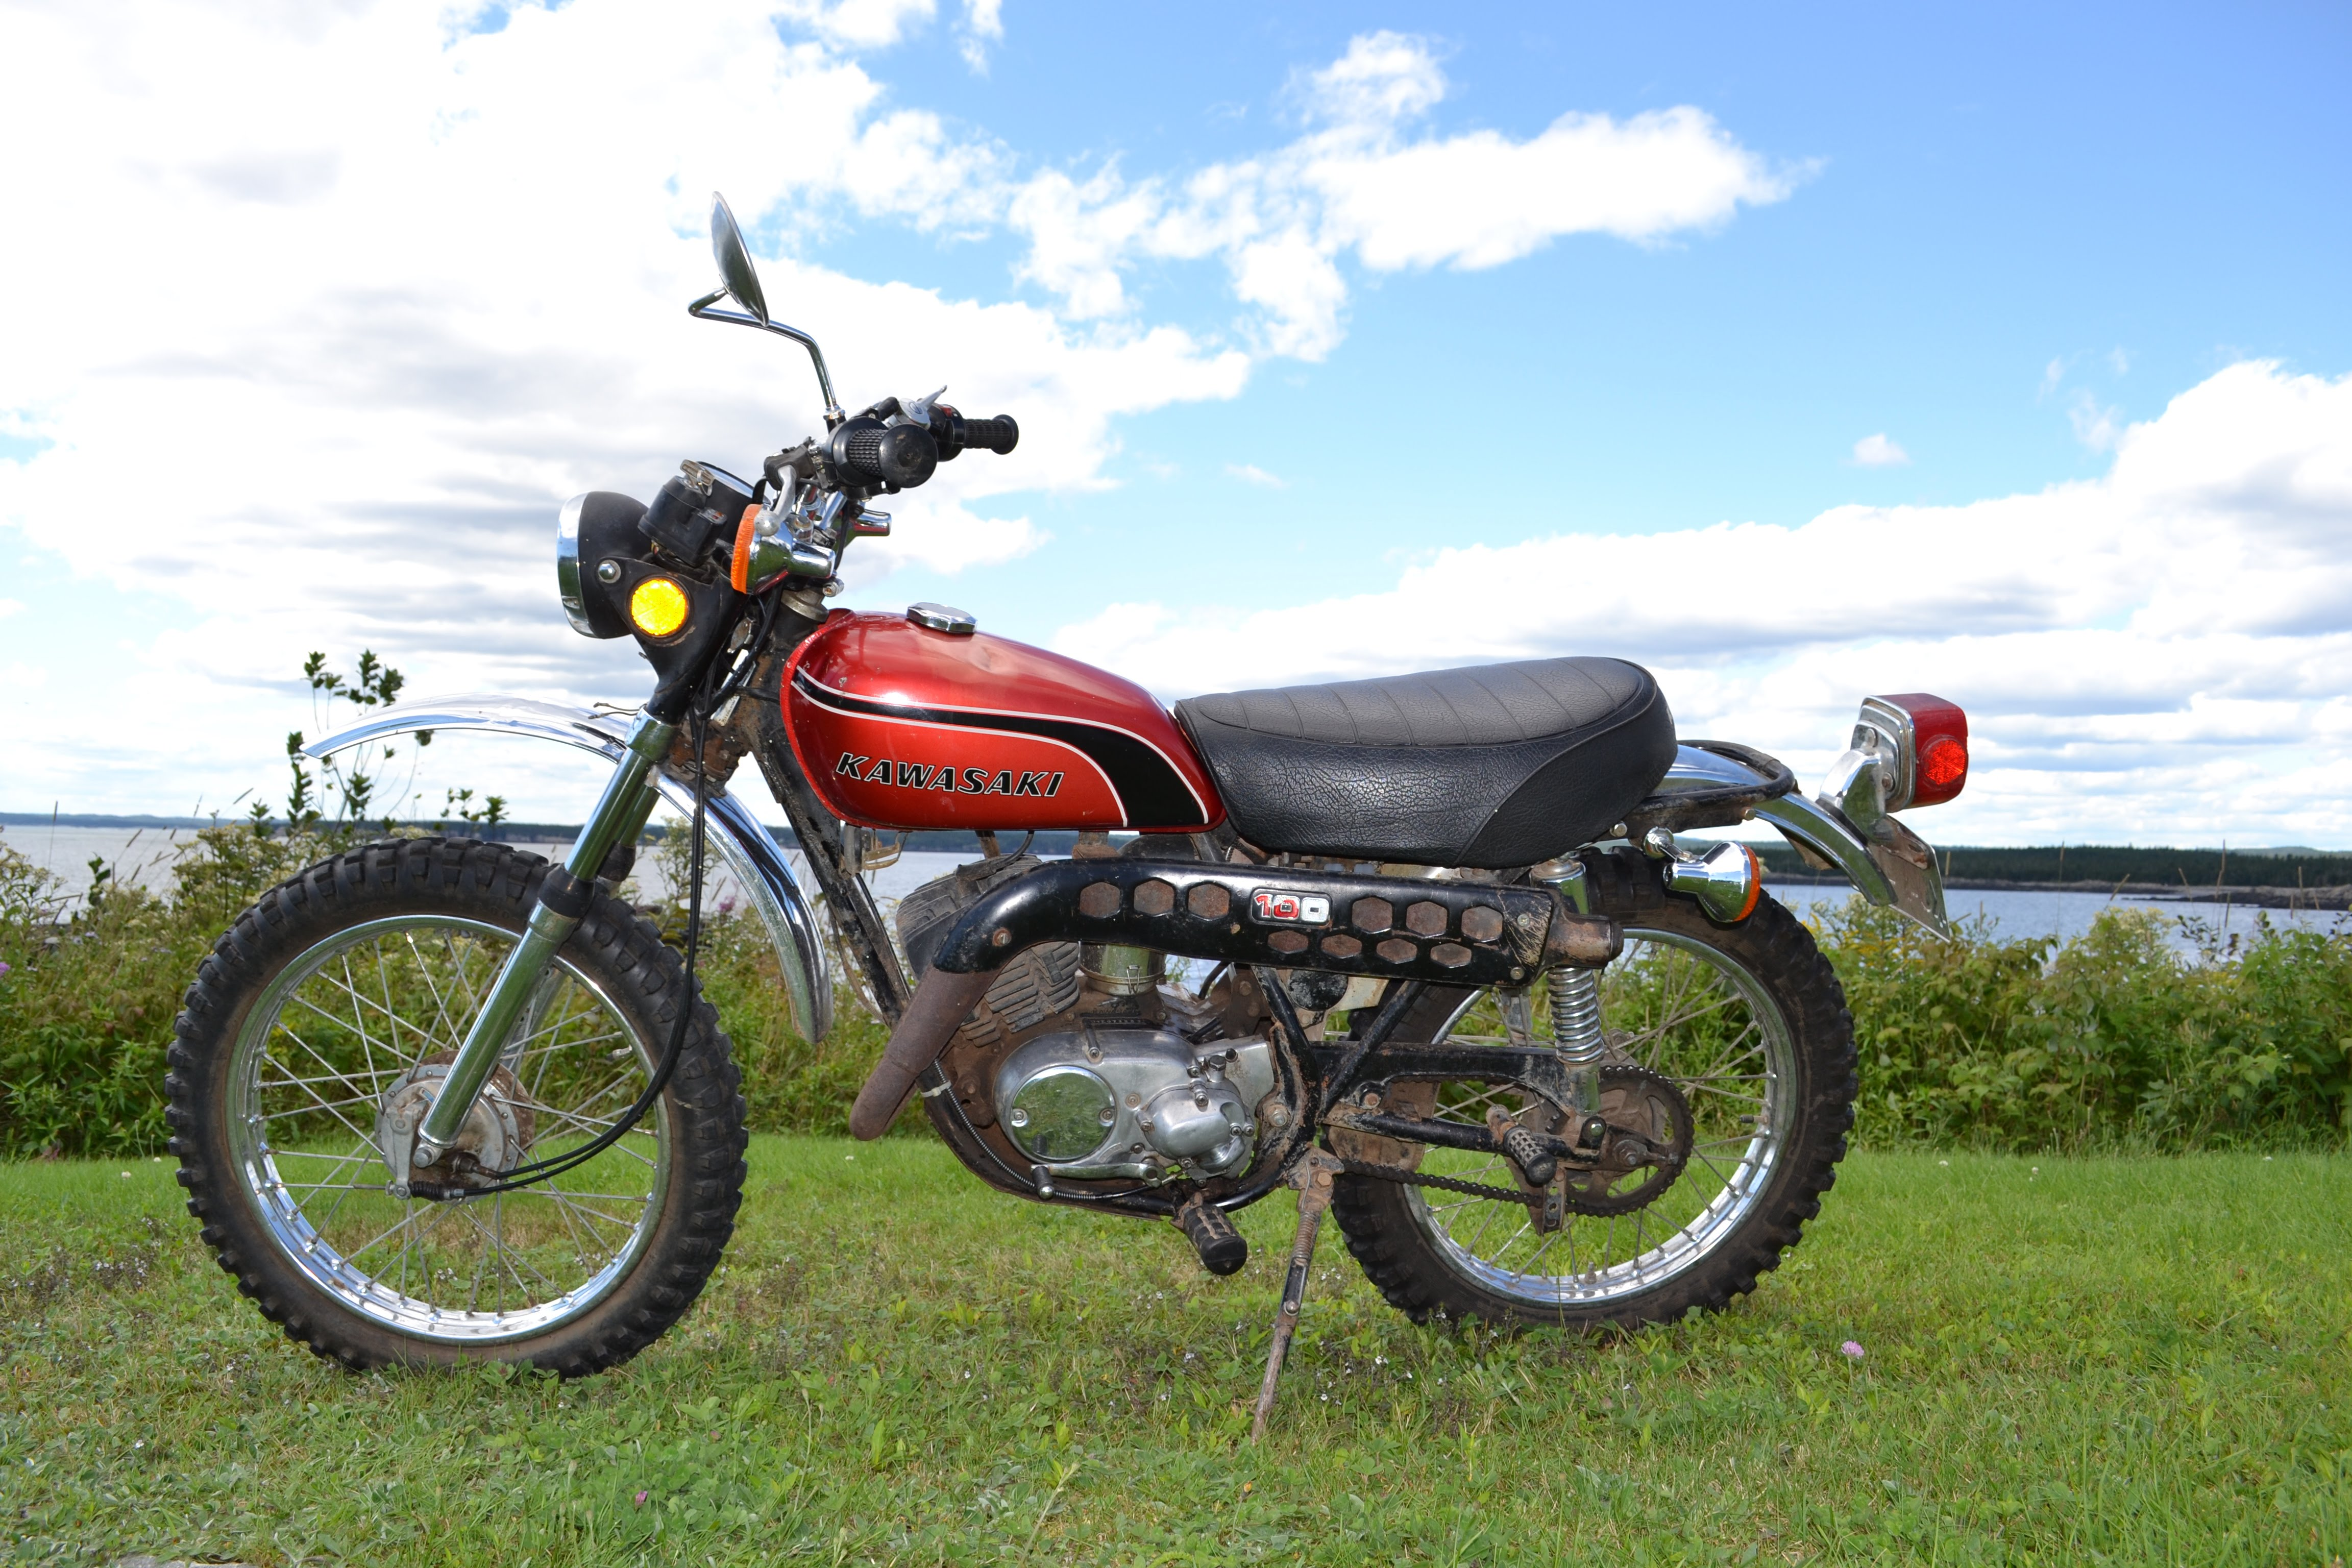 1975 Kawasaki G4tr Wiring Diagram Library Of Diagrams G5 1974 G4 Tr 100 Home Rh Classicjapcycles Com 1972 Enduro